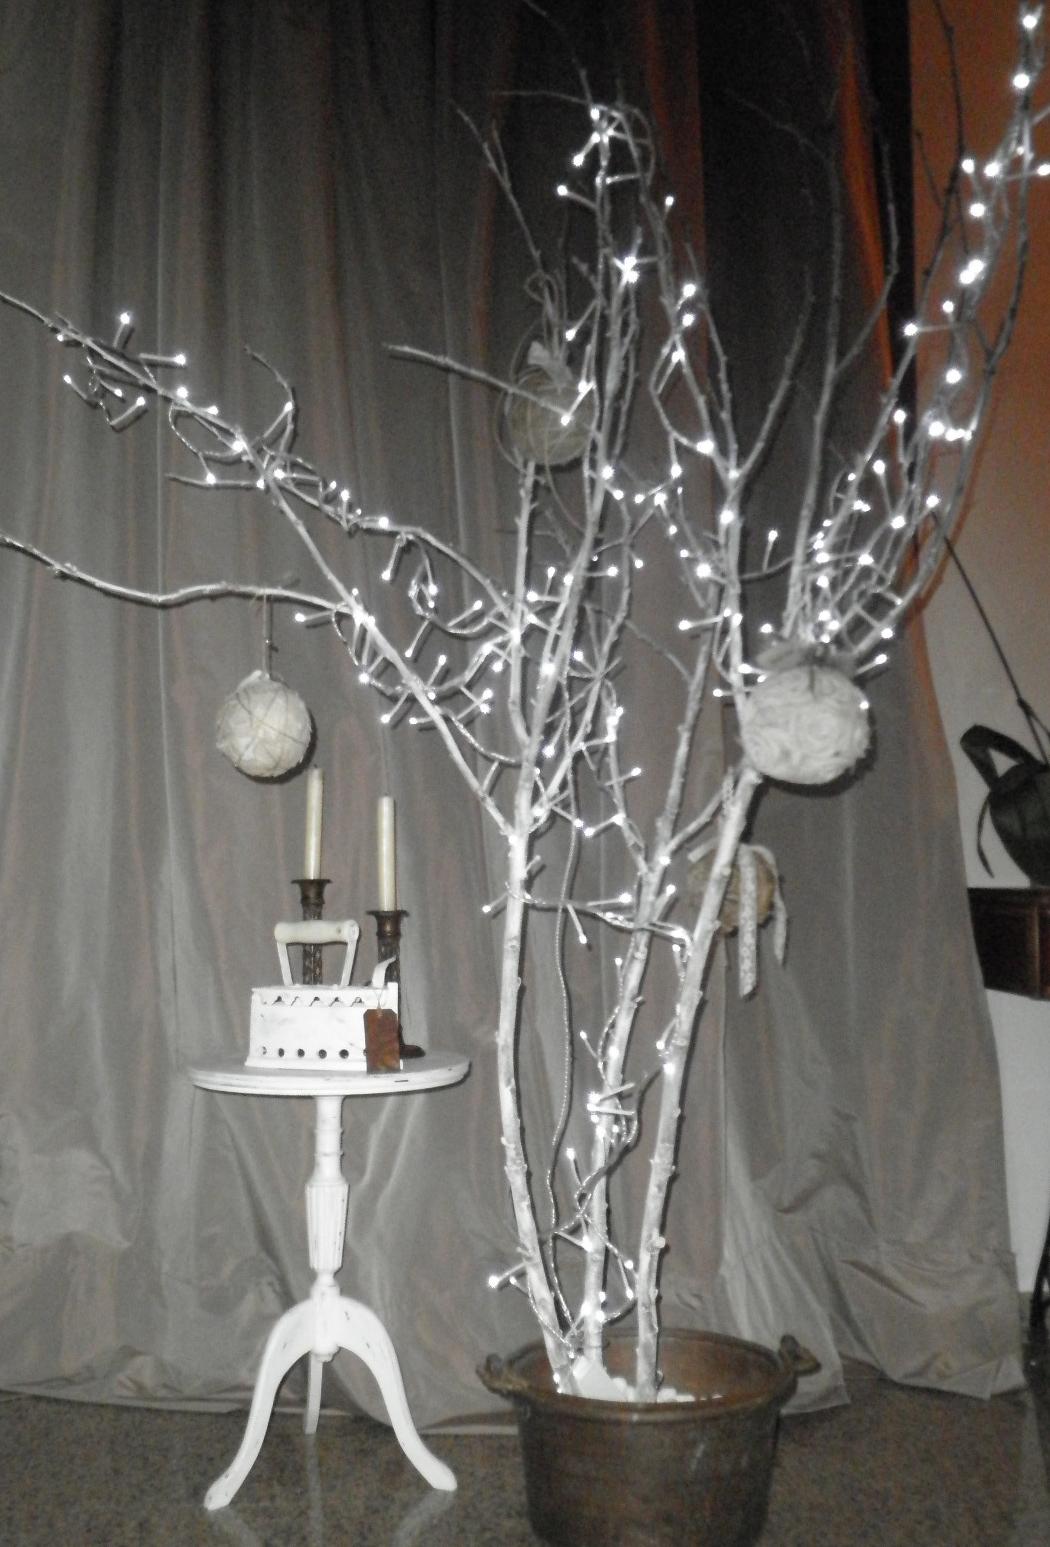 Magic bus bianco natale - Rami decorativi natalizi ...